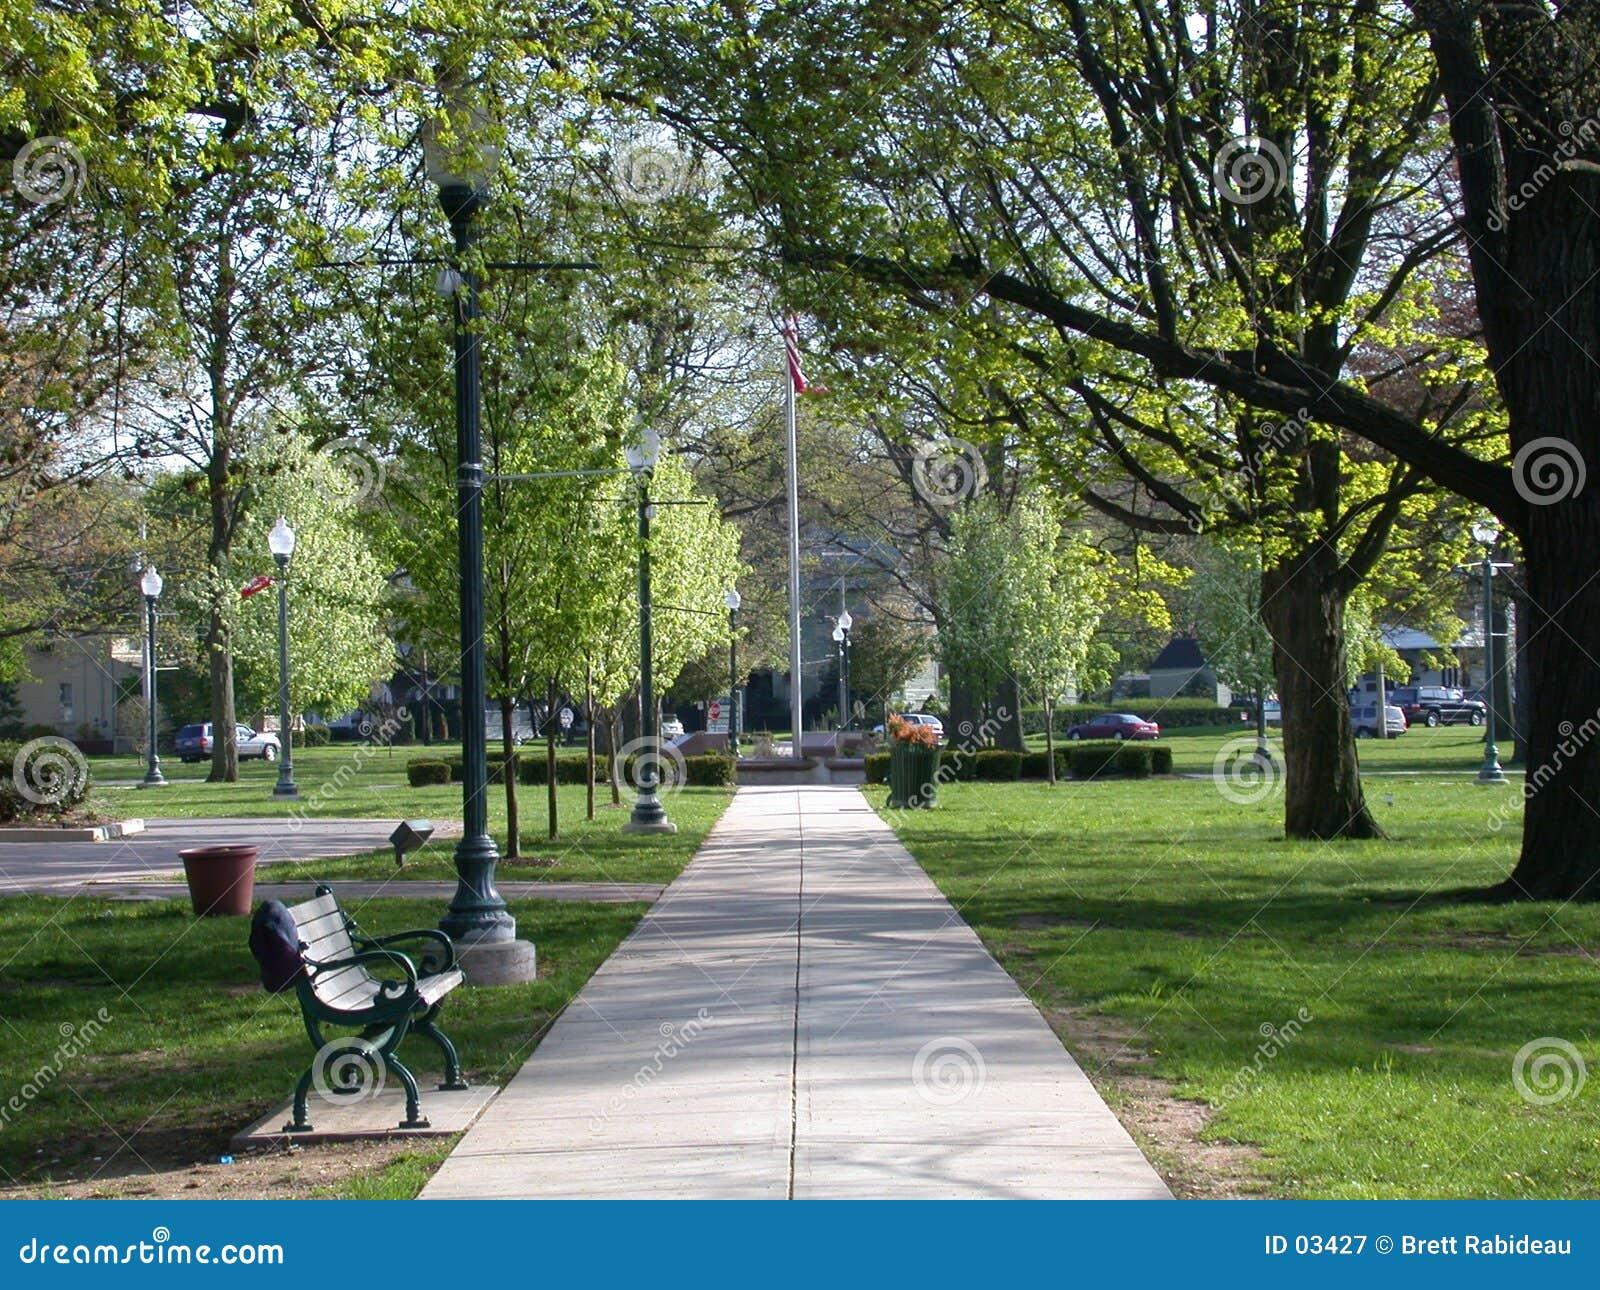 Park city   the pathway